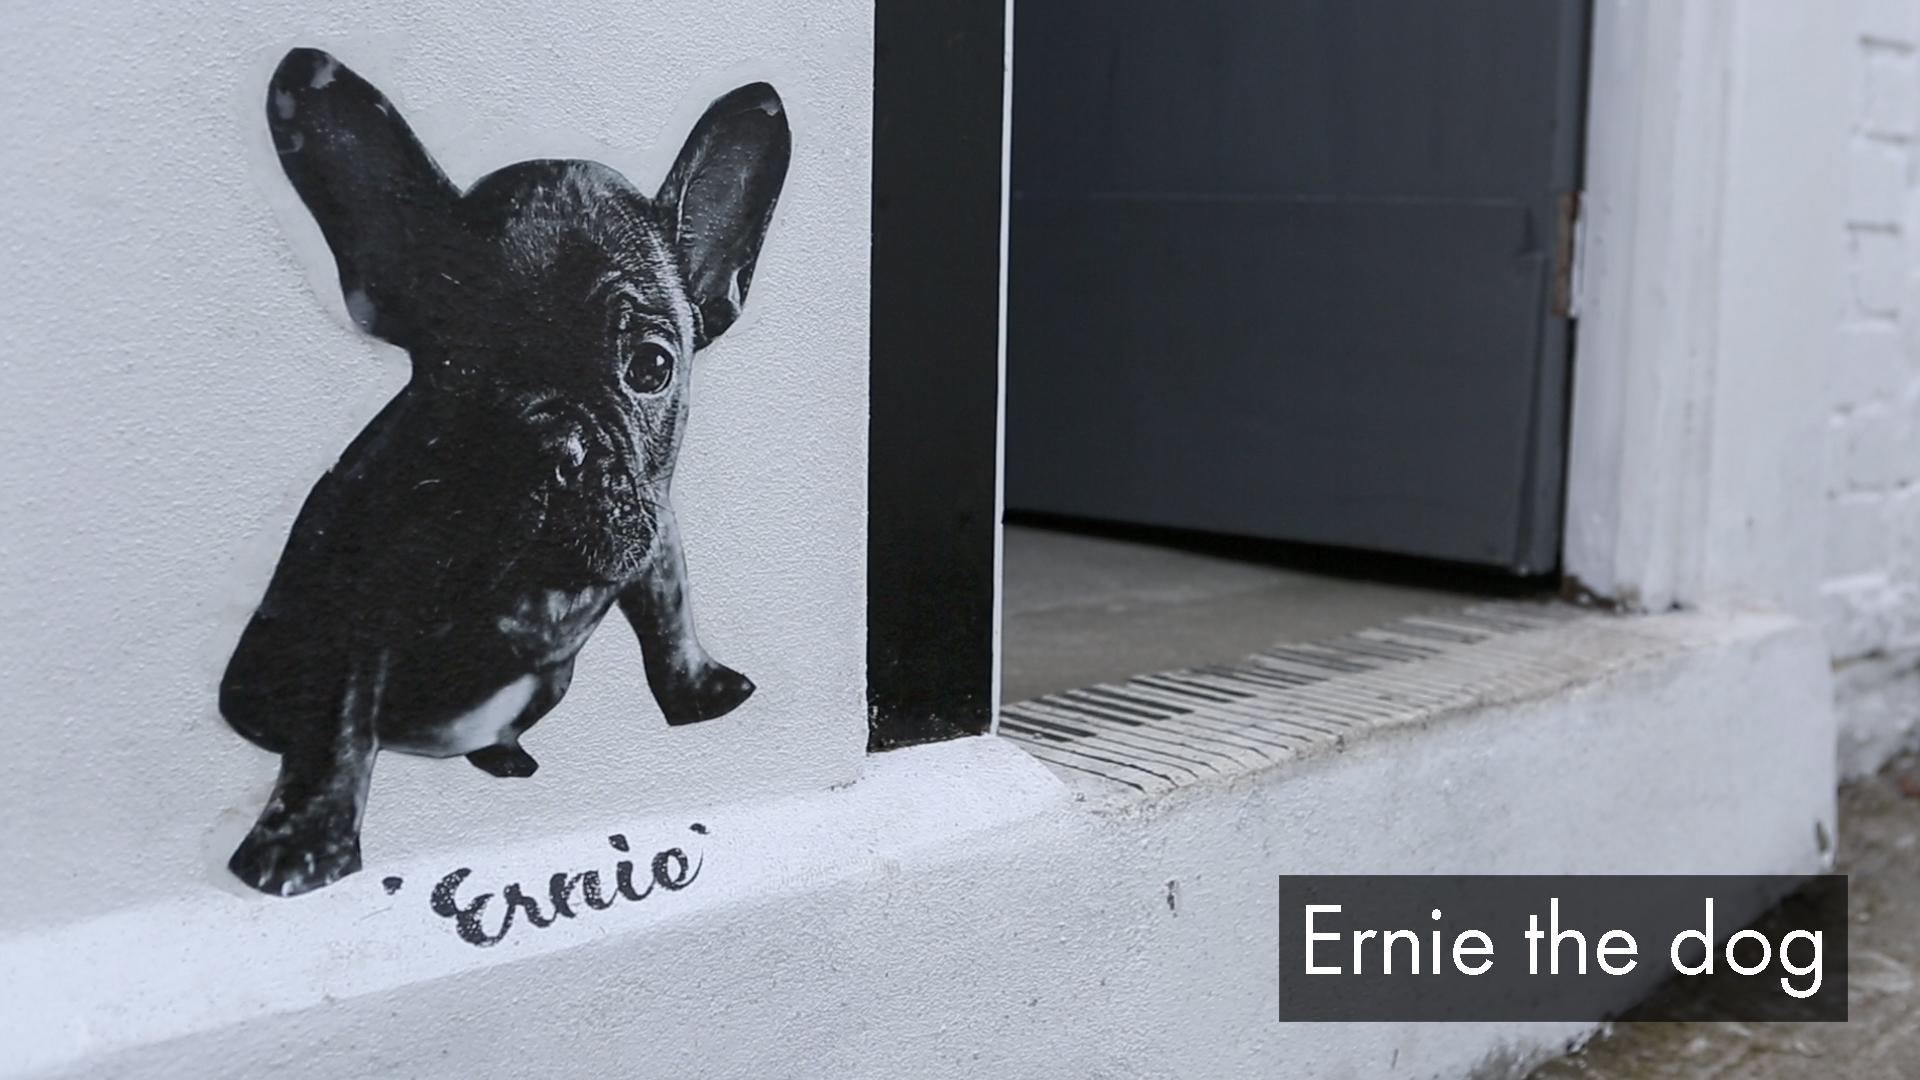 ErnietheDog.jpg